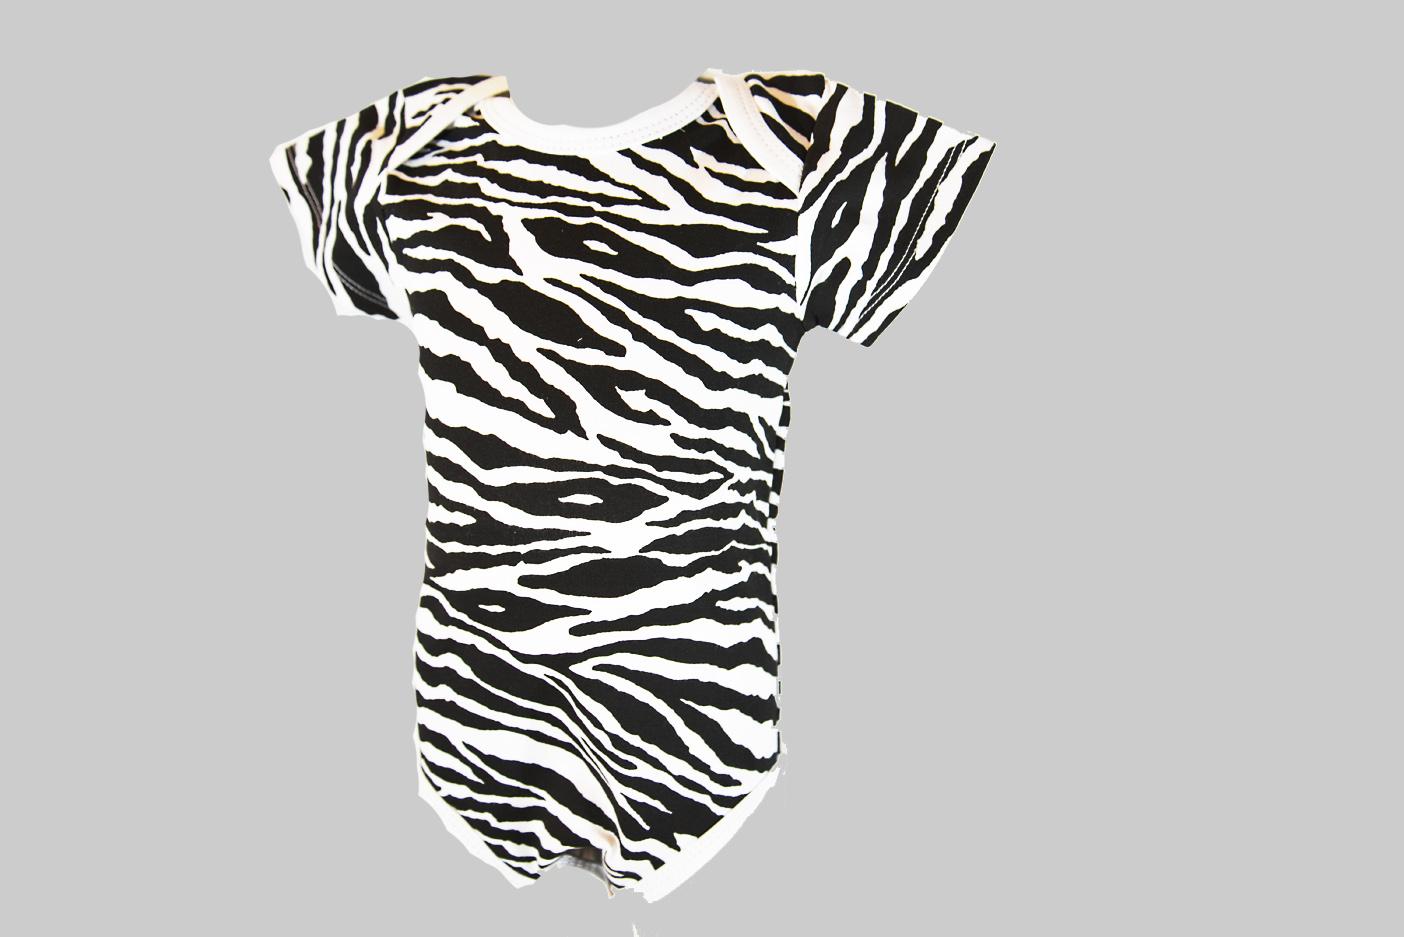 Zebra Print Baby Jumpsuit